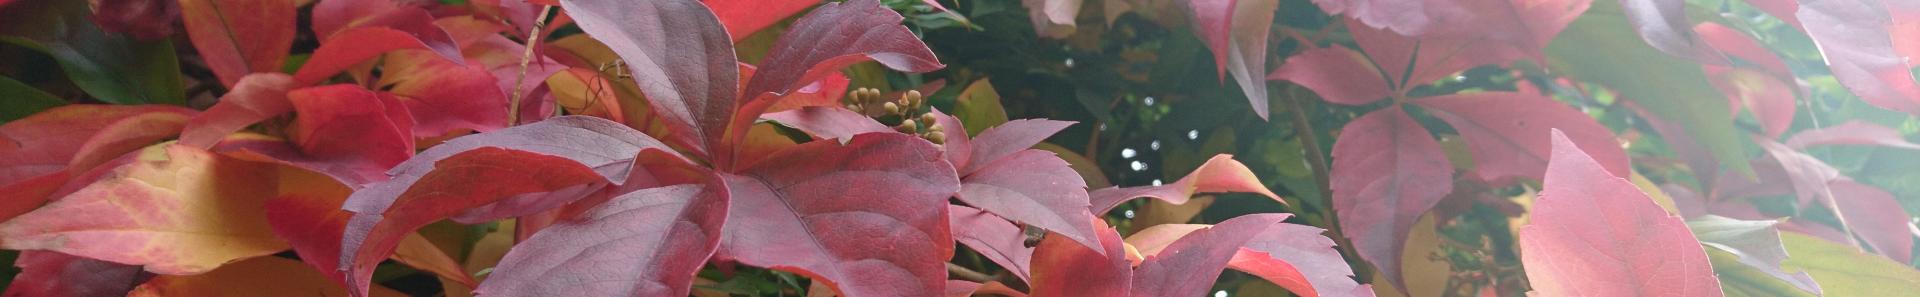 Banner - Herbst2021